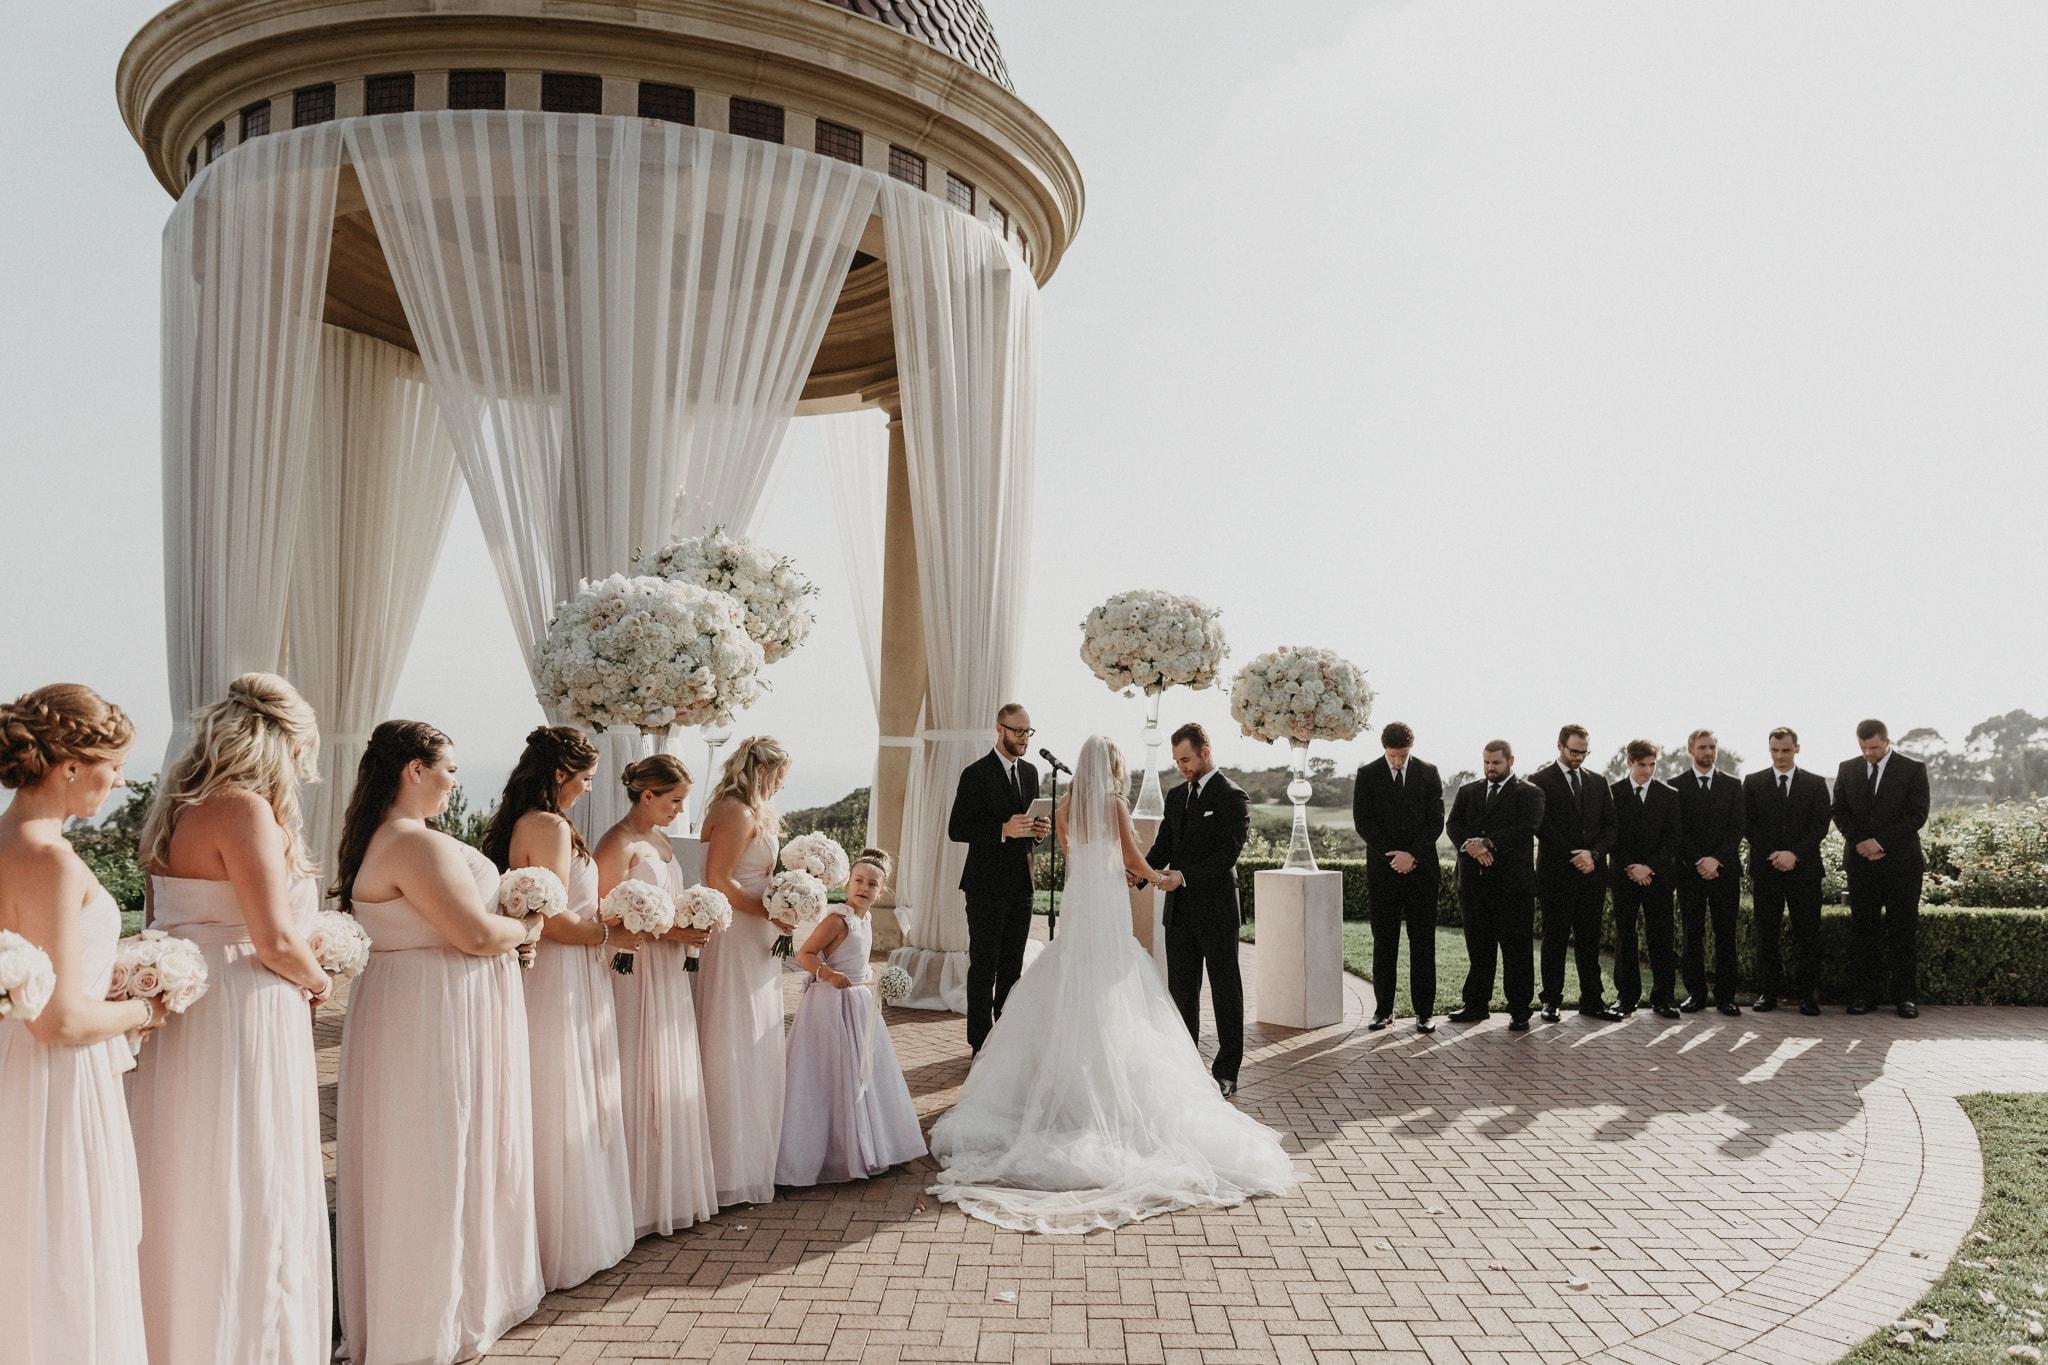 041-the-resort-at-pelican-hill-wedding.jpg